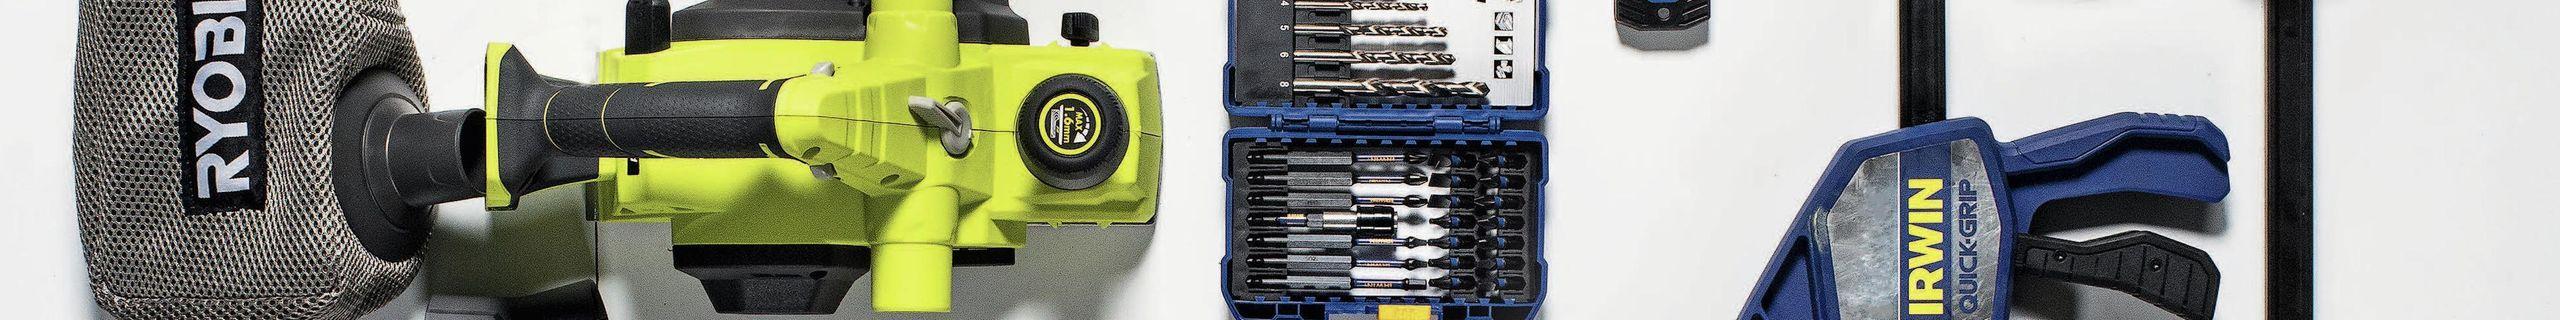 Power tools - Hand tools - Safety glasses - Flatlay - Bunnings magazine - Medium - Rotated - Ryobi - Irwin - Makita